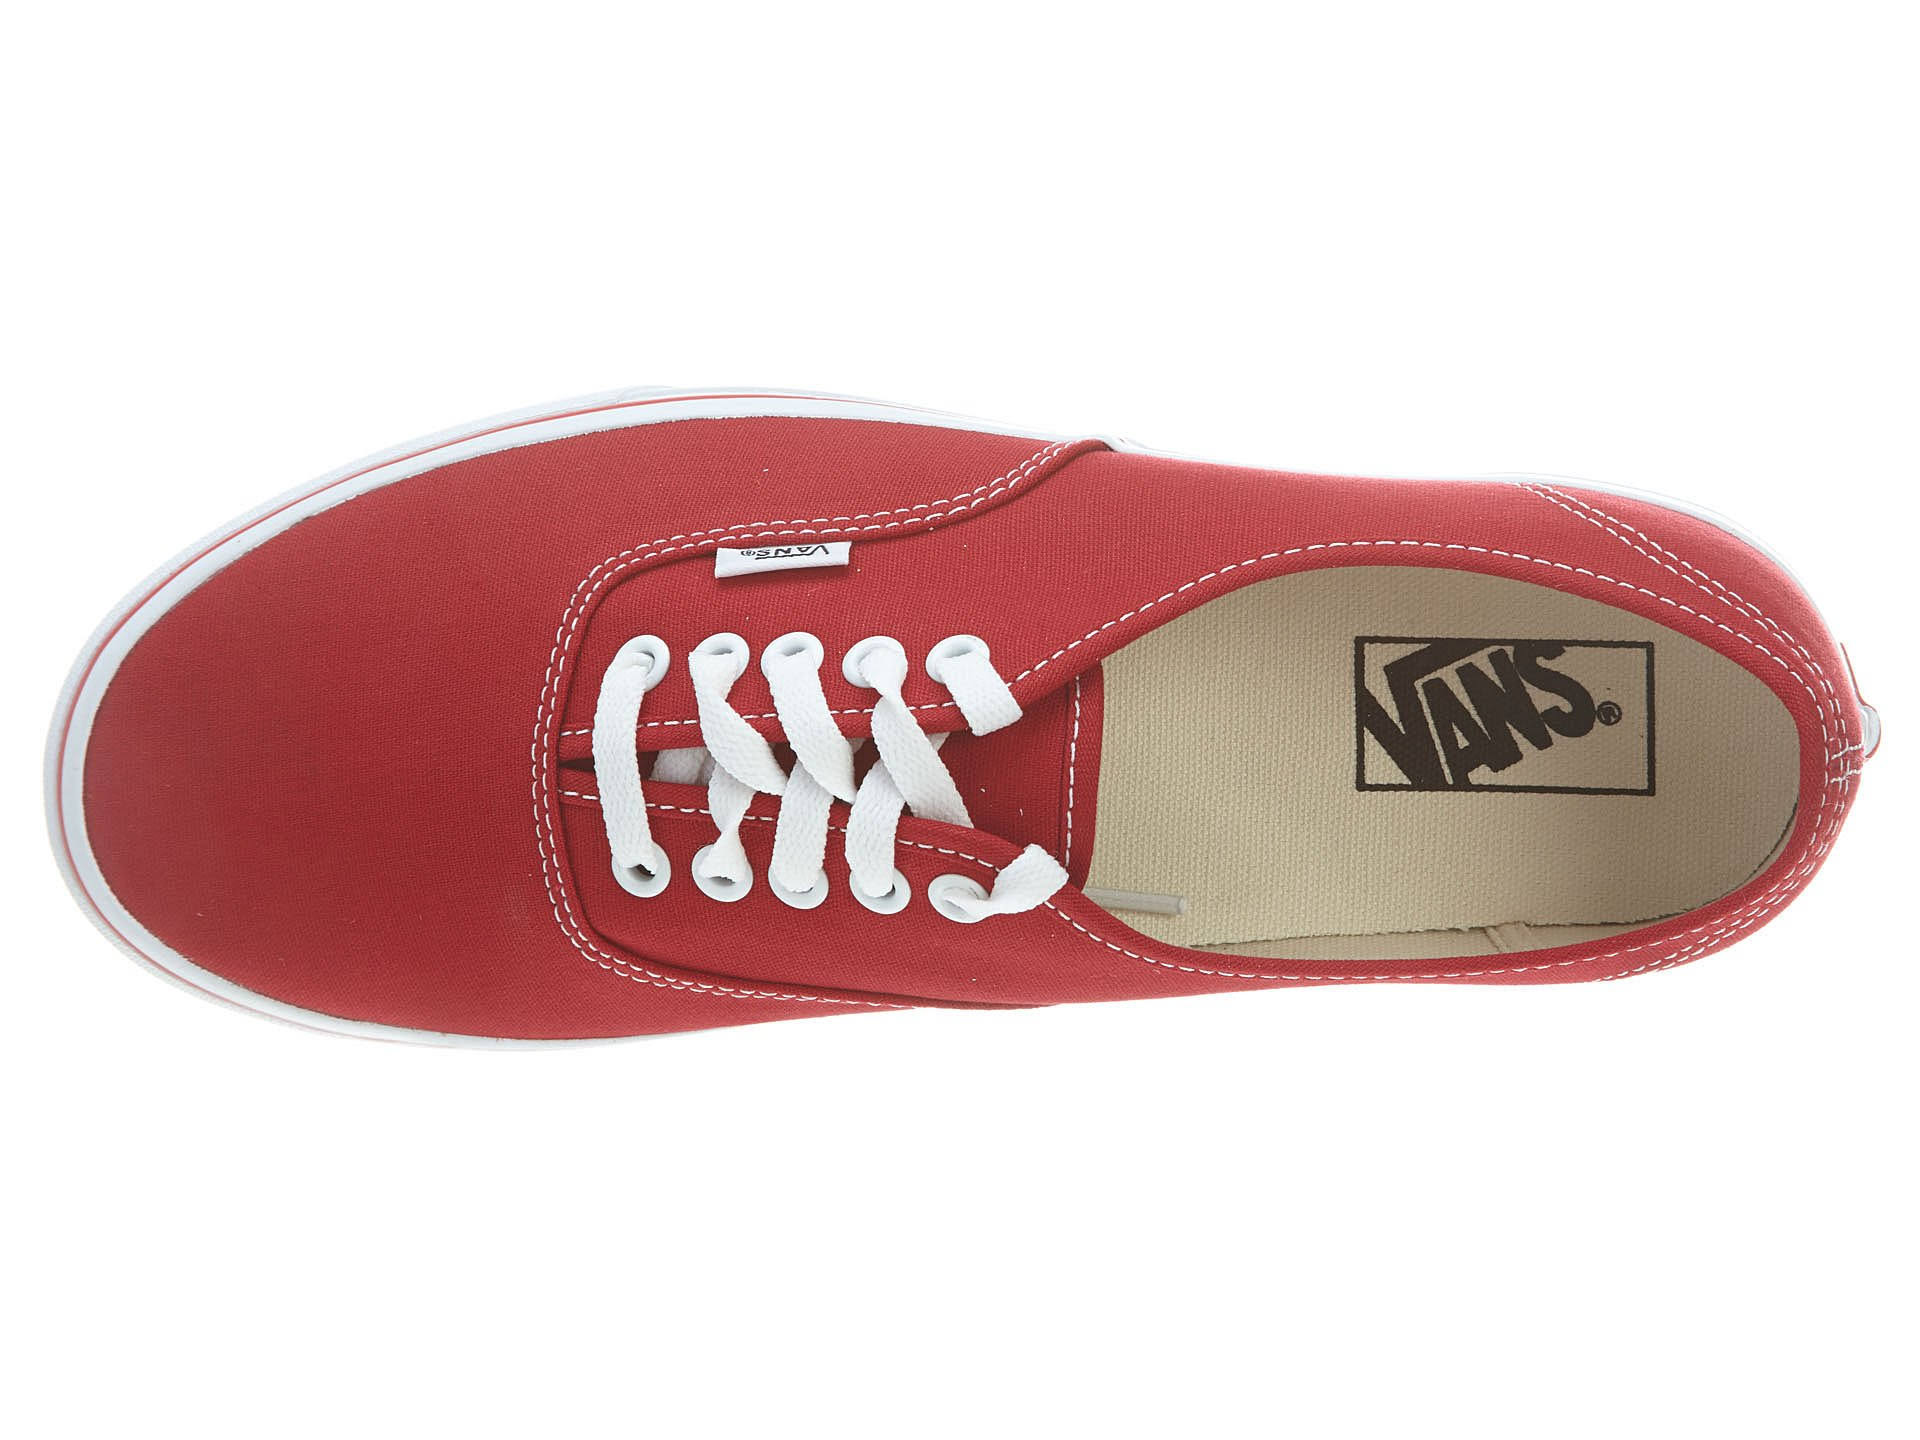 Purple Authentic Canvas Men 9 Red51 Sneakers Vans 5 Tamaño Red dtqTFt